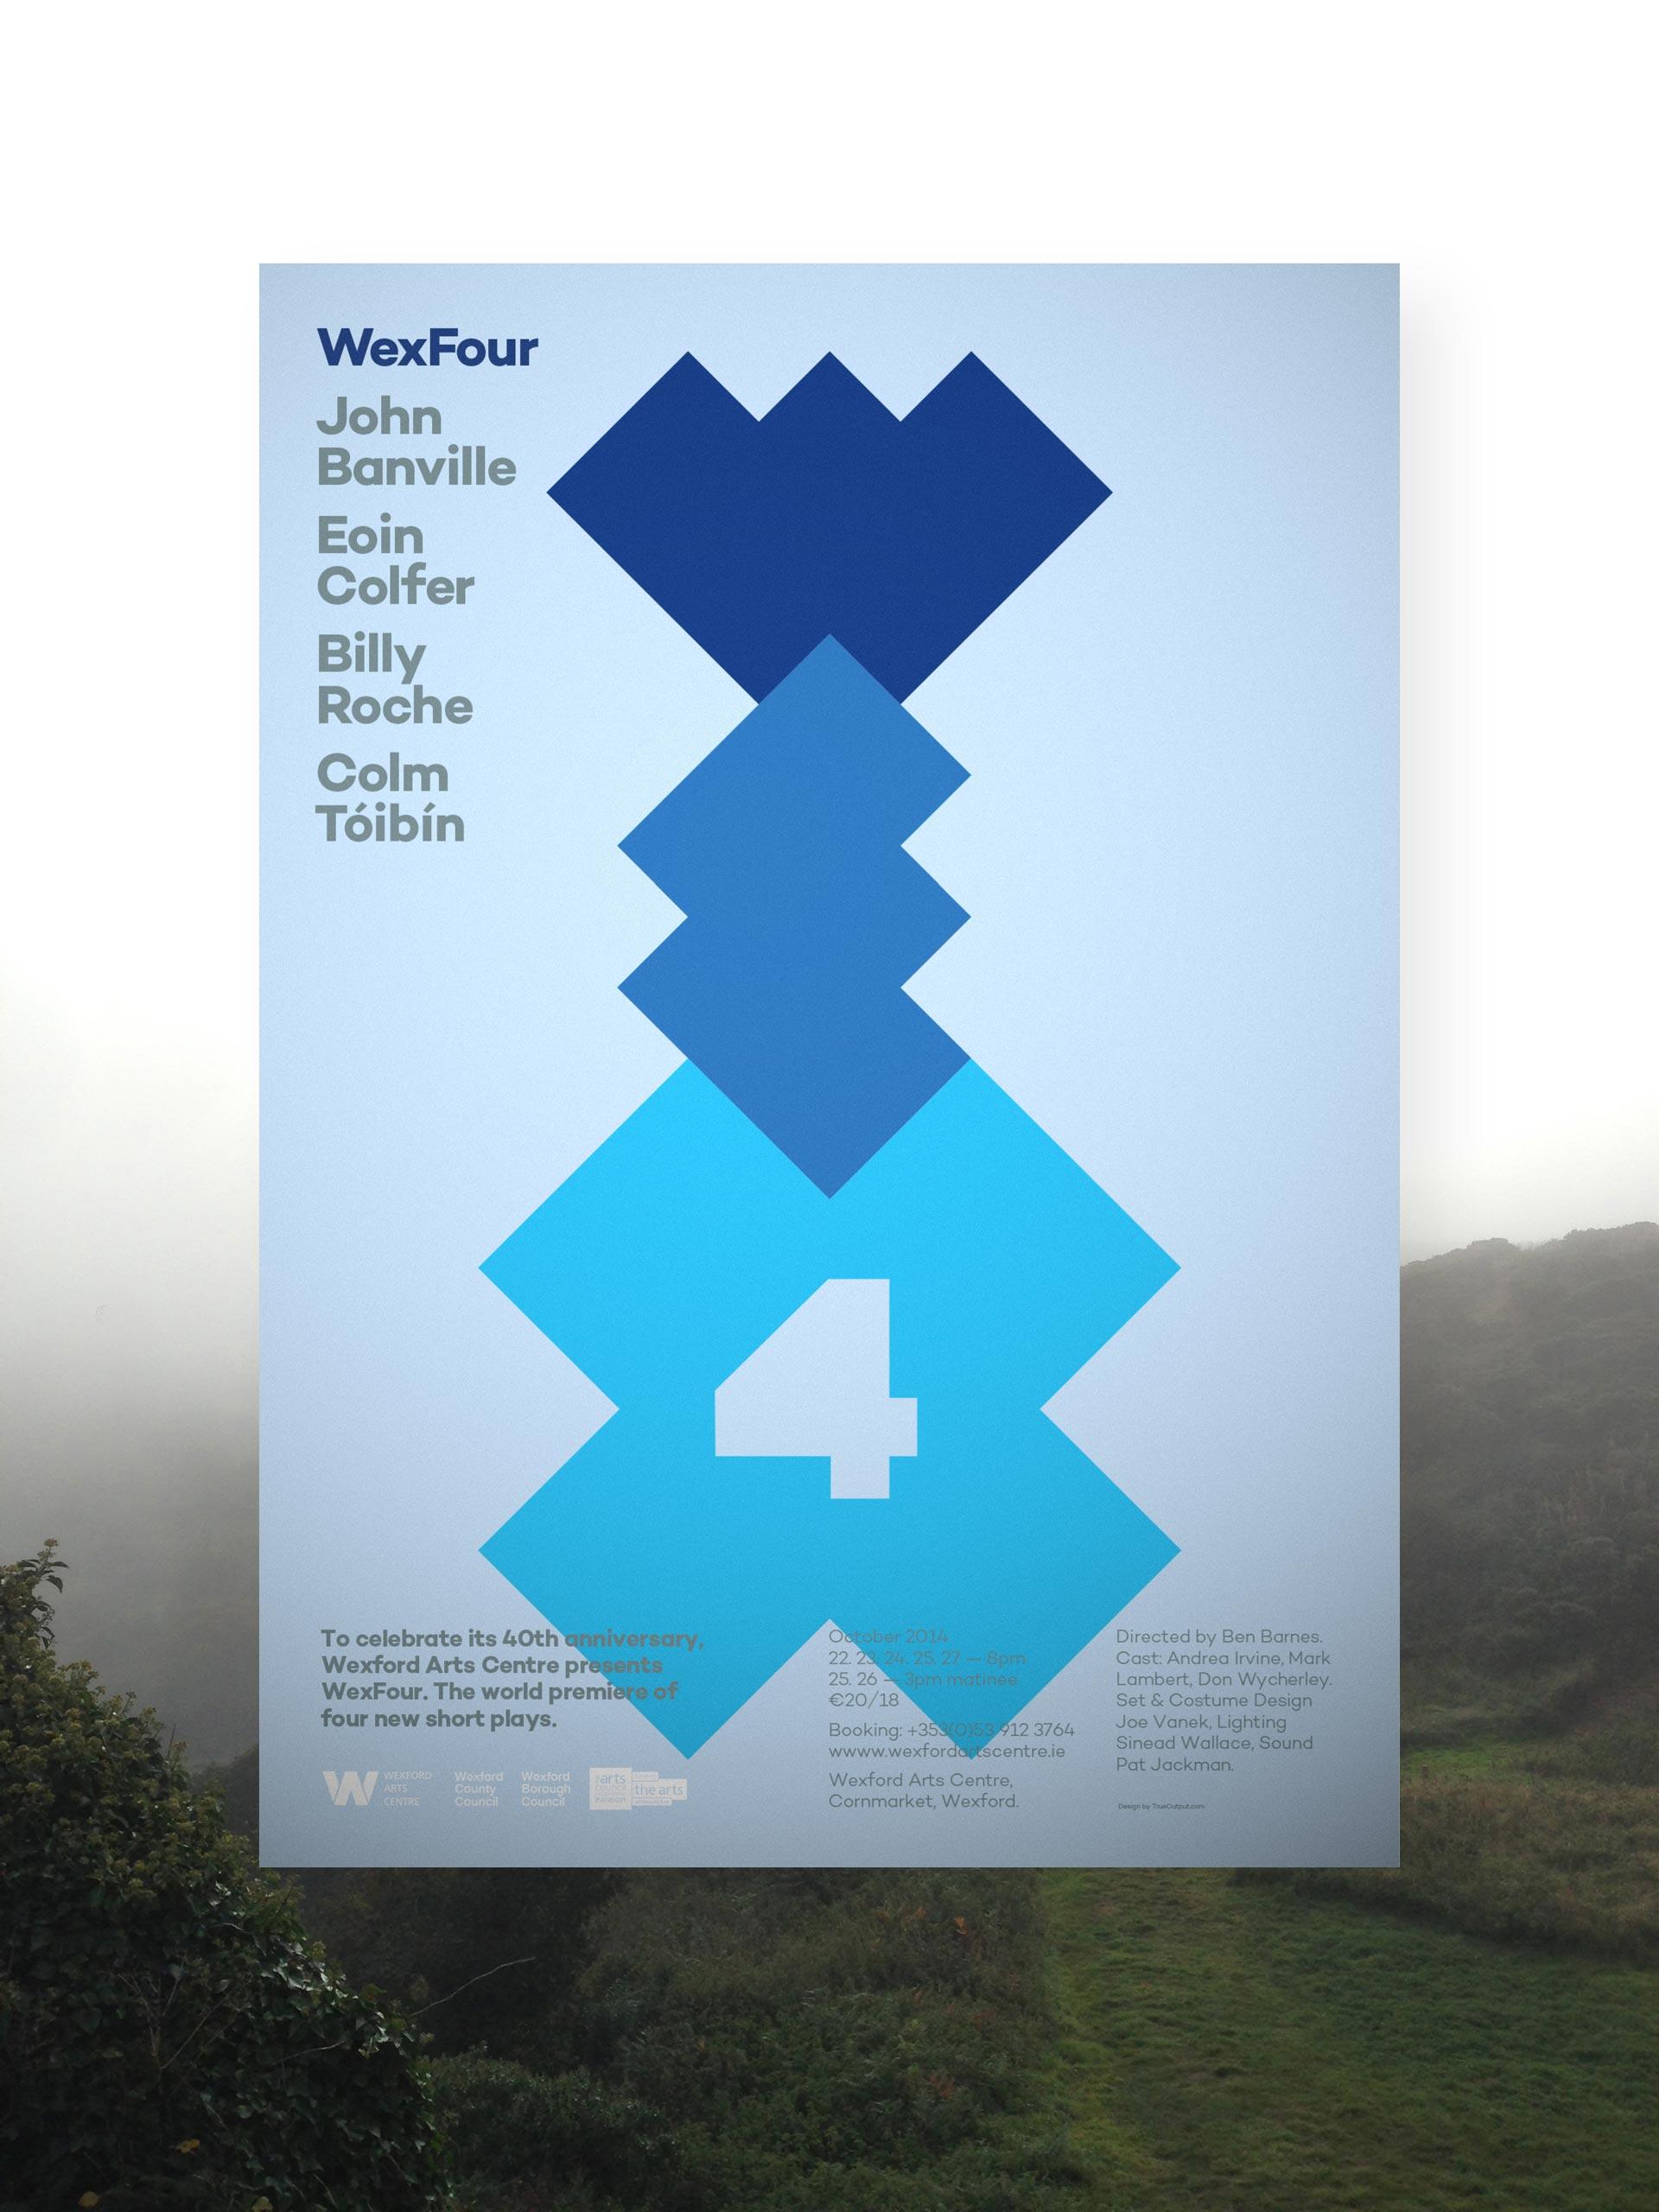 TrueOutput - Wexfour